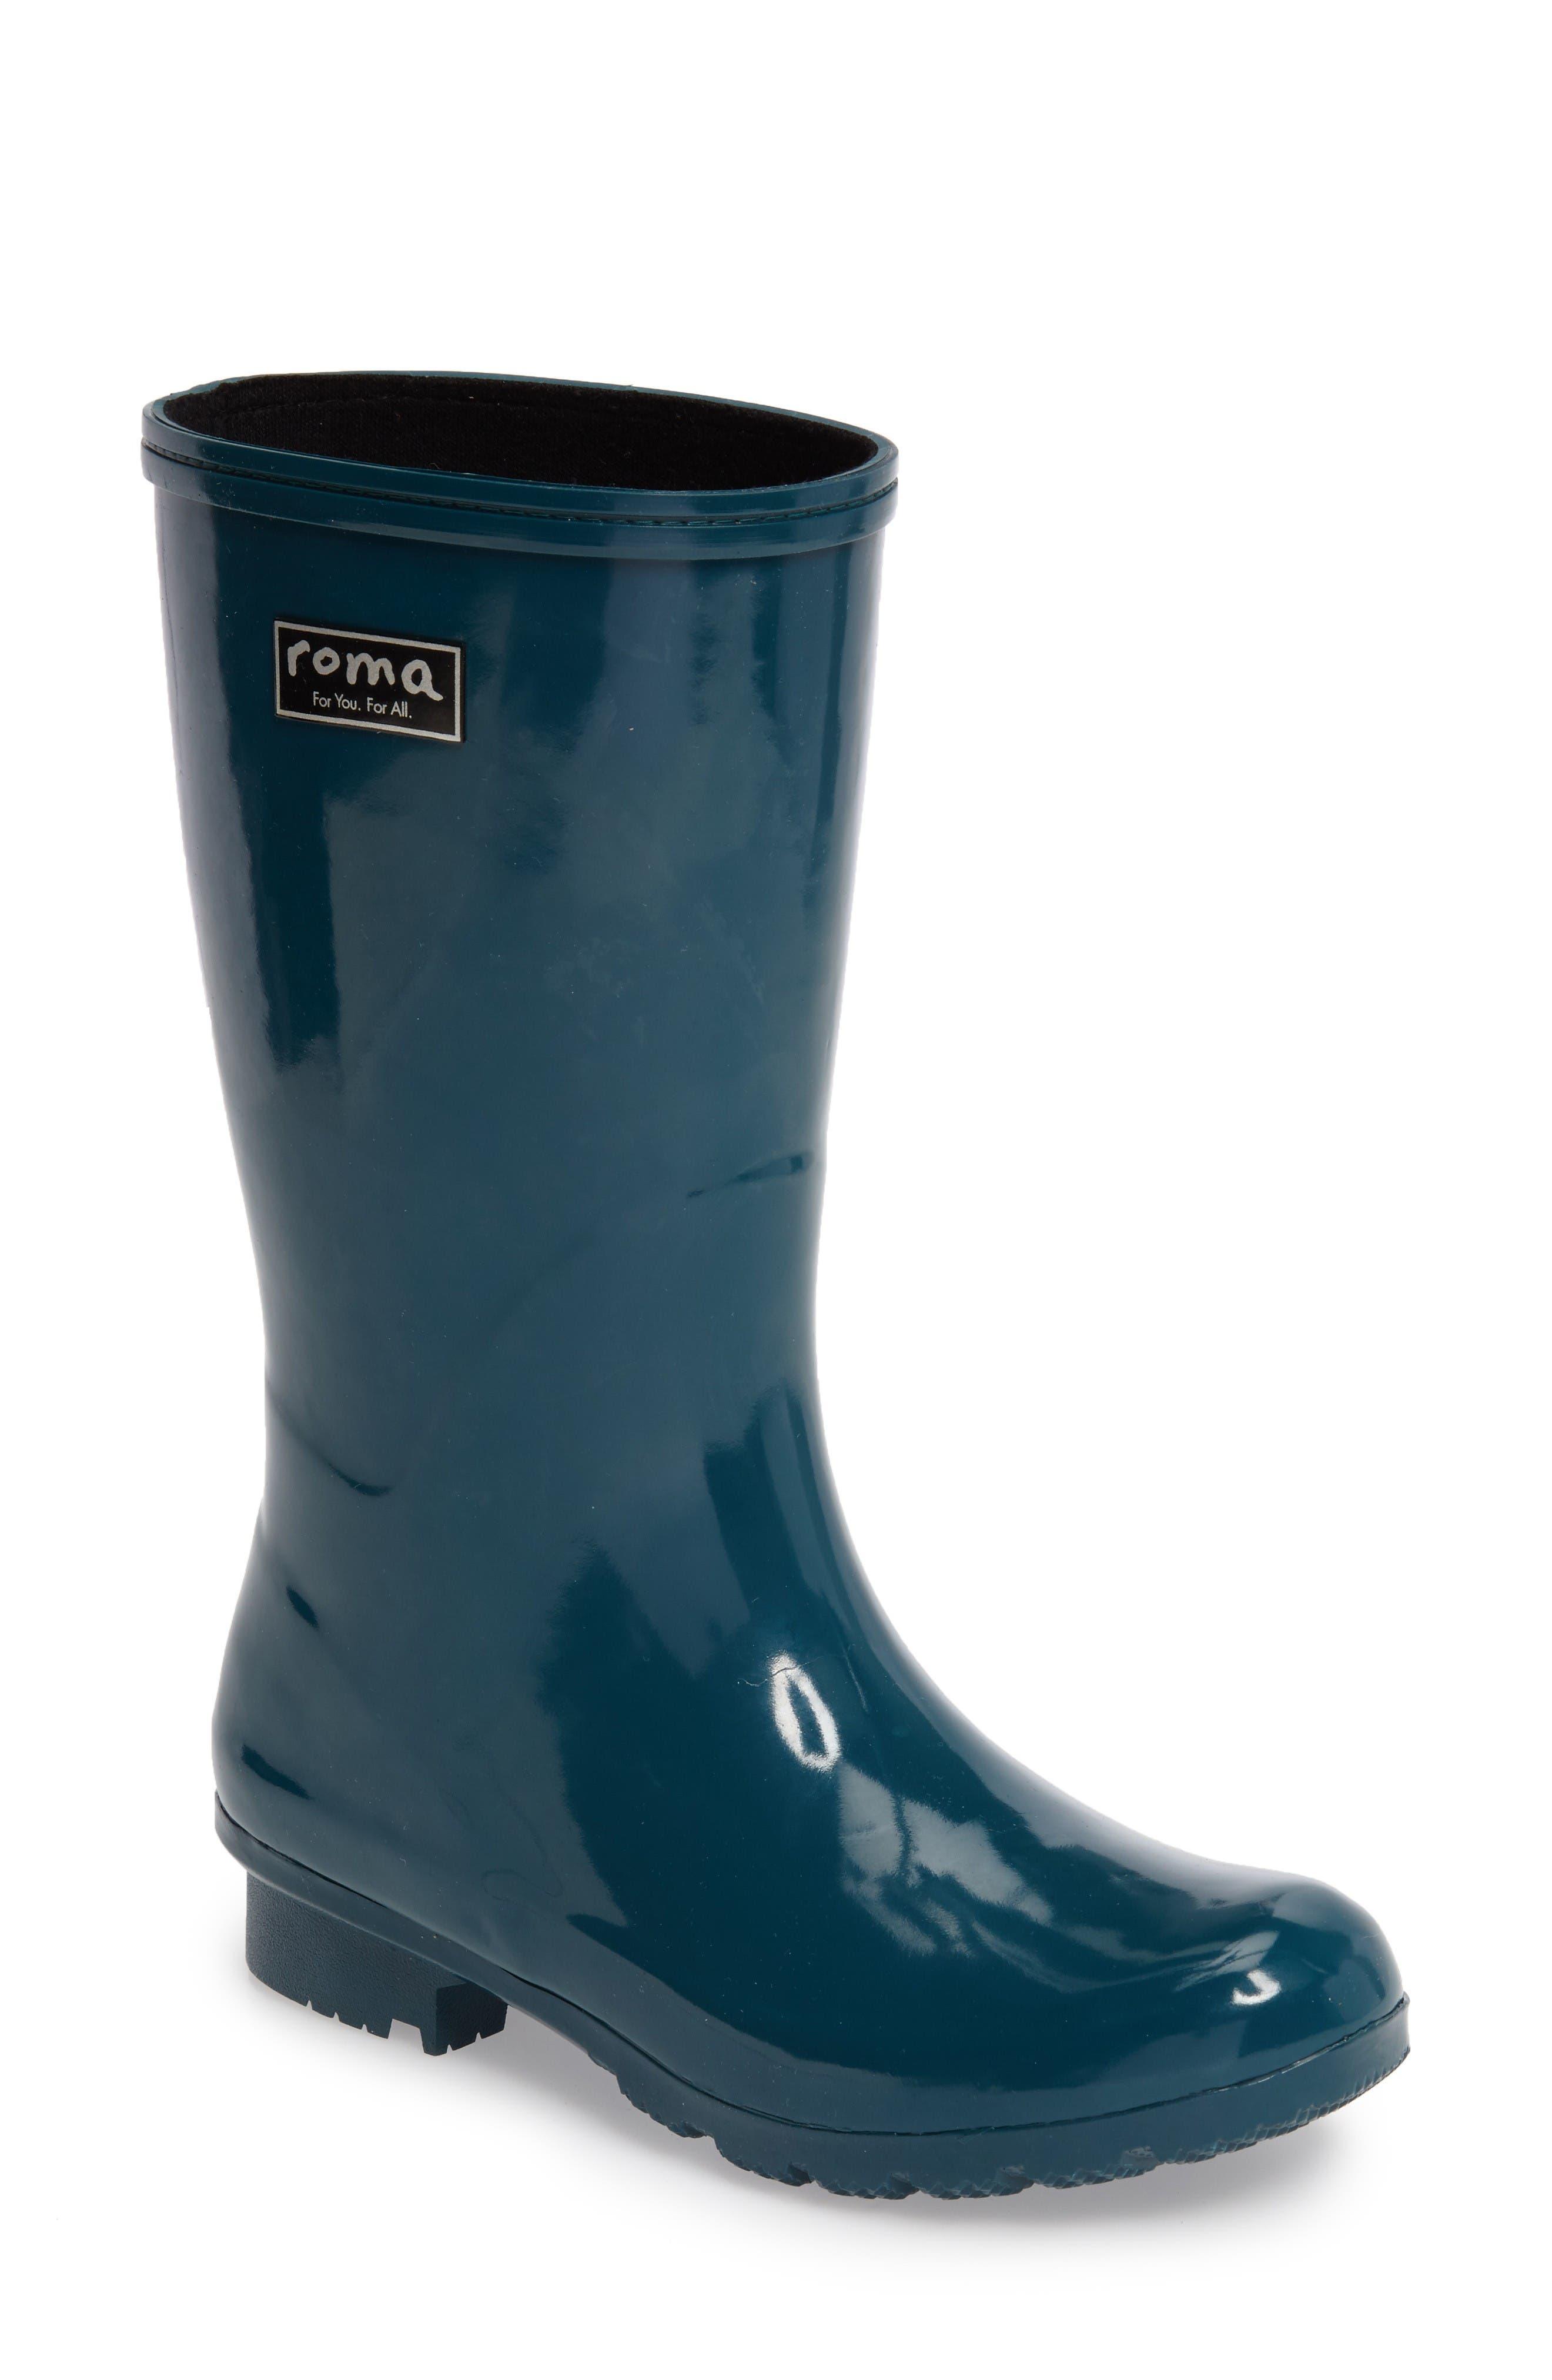 Alternate Image 1 Selected - roma Short Rain Boot (Women)